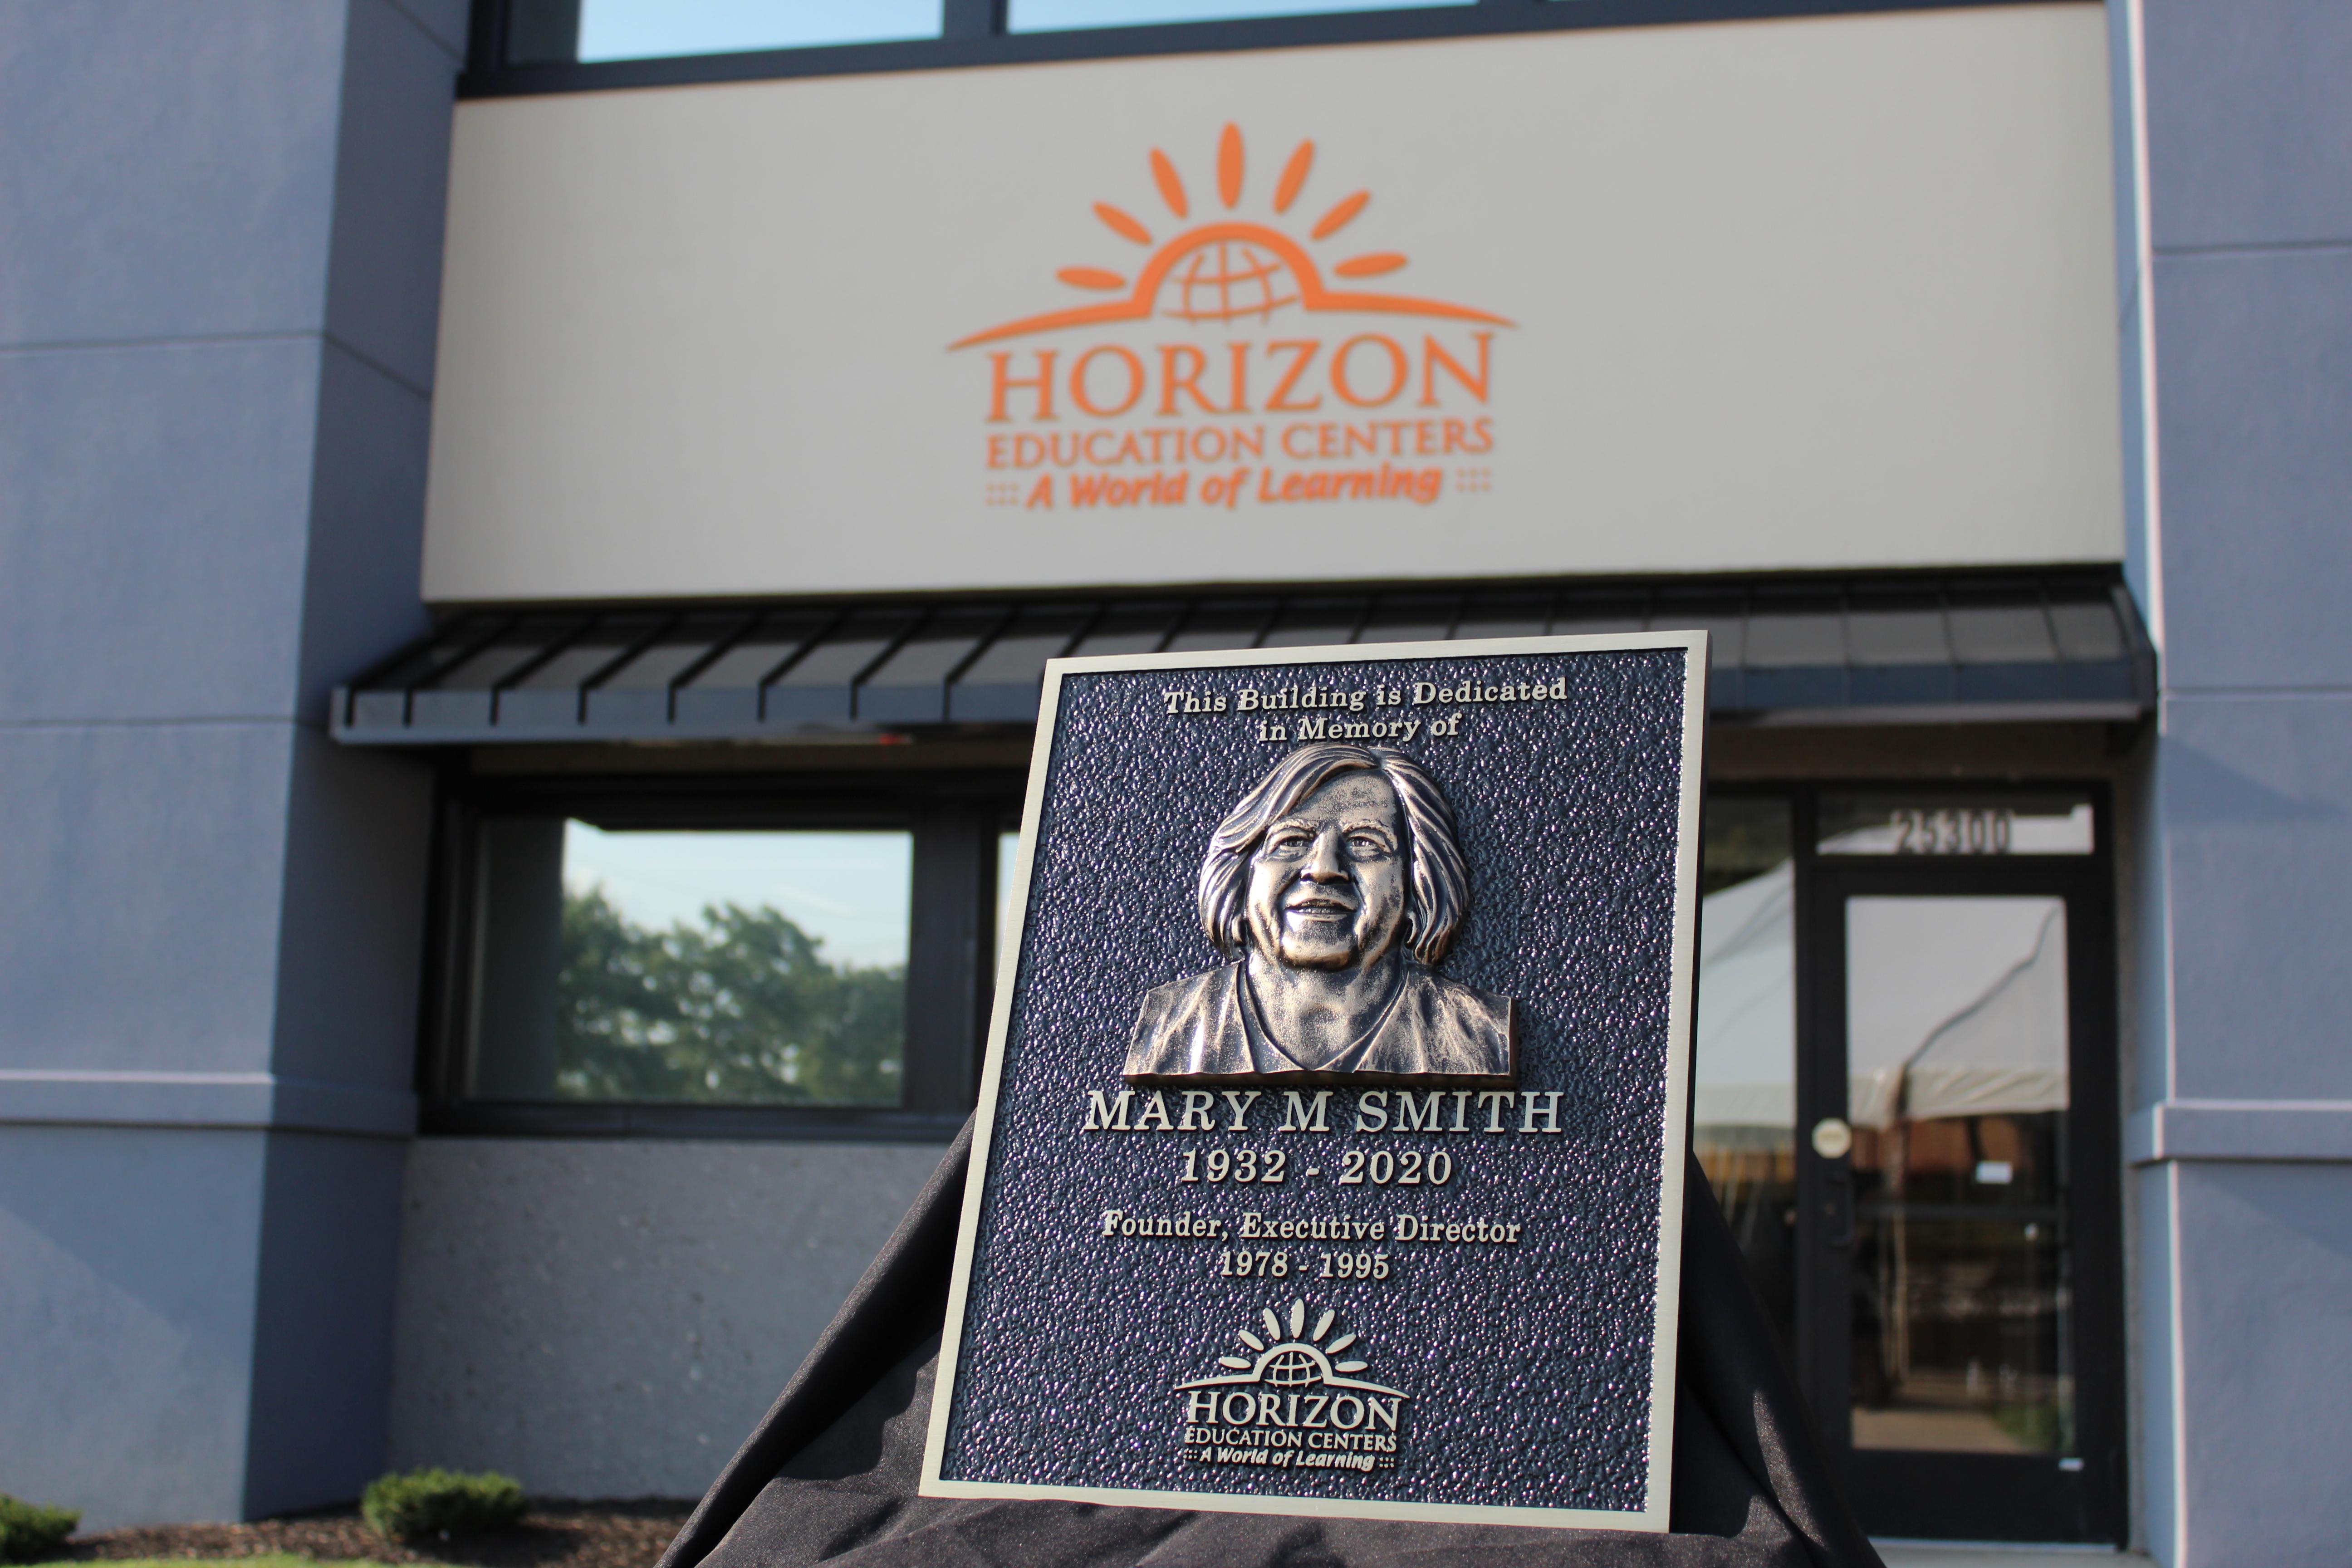 Horizon Administration Building Dedicated To Mary Smith